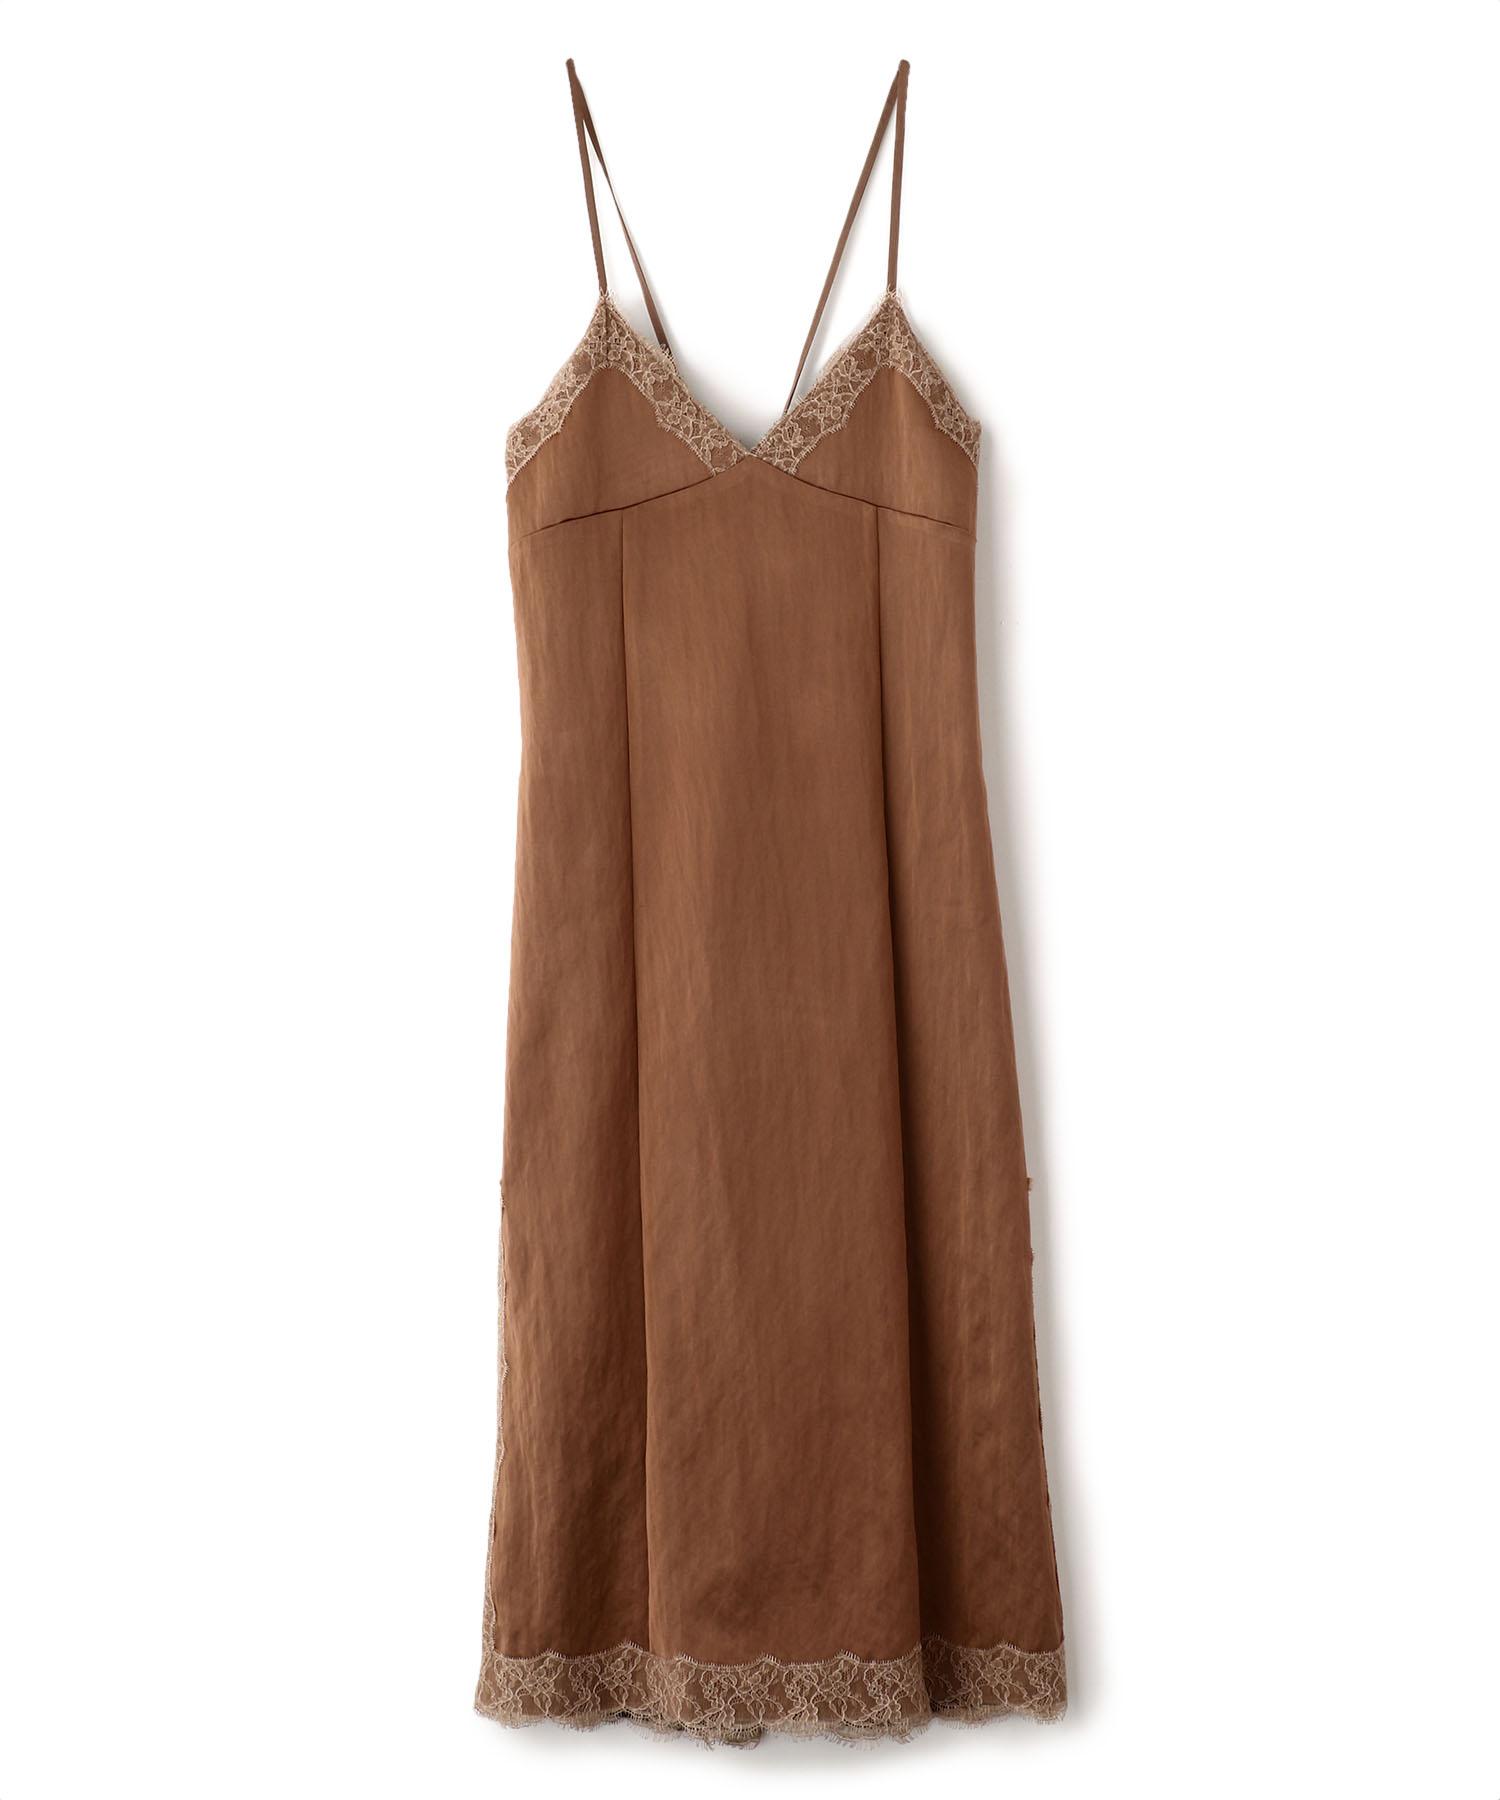 Satin Lace Camisole Dress